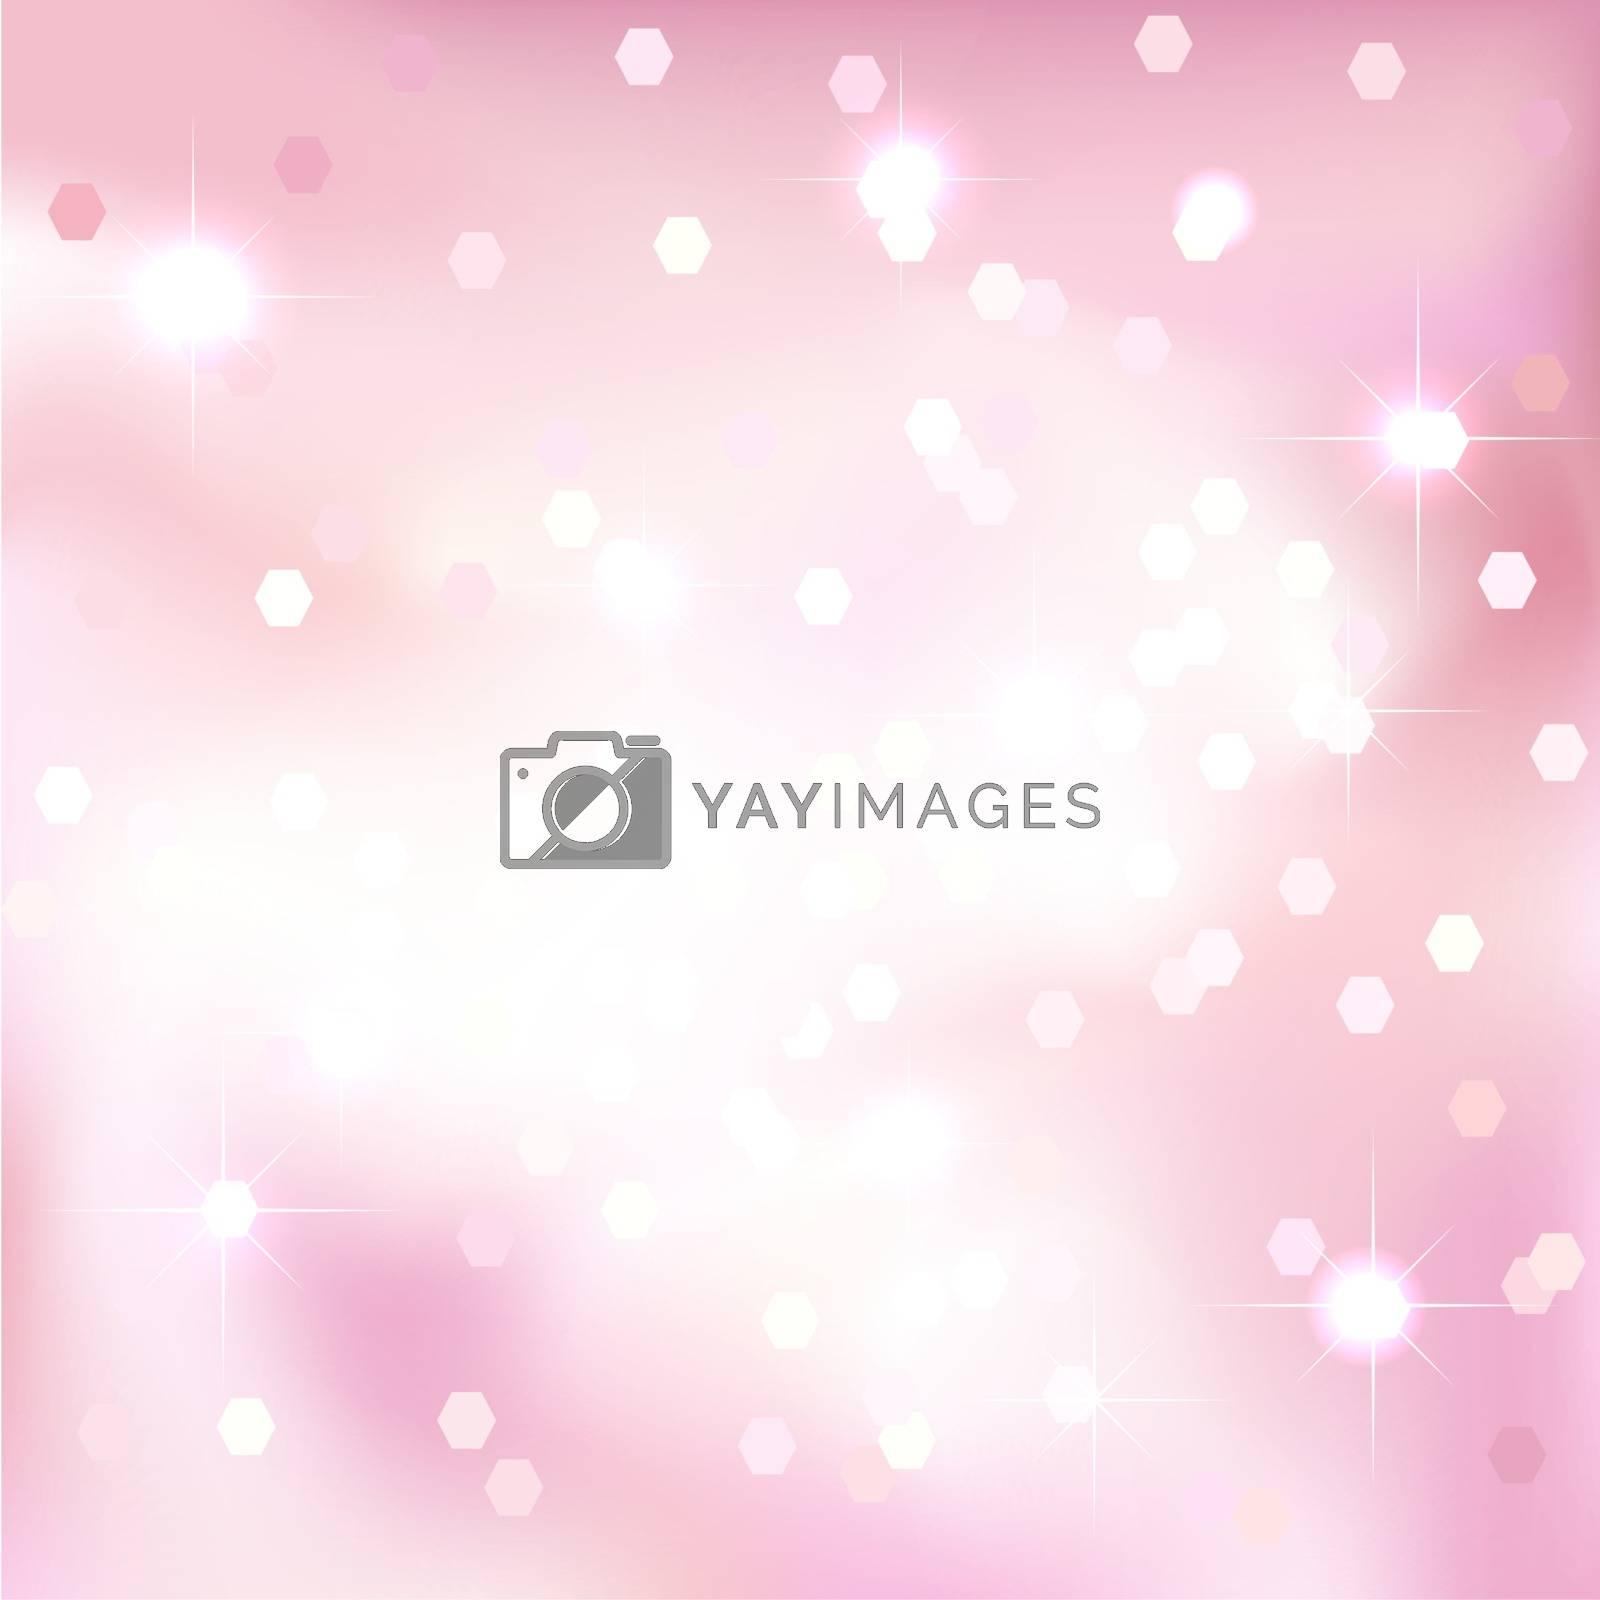 Bright light pink background. Festive design. Christmas style